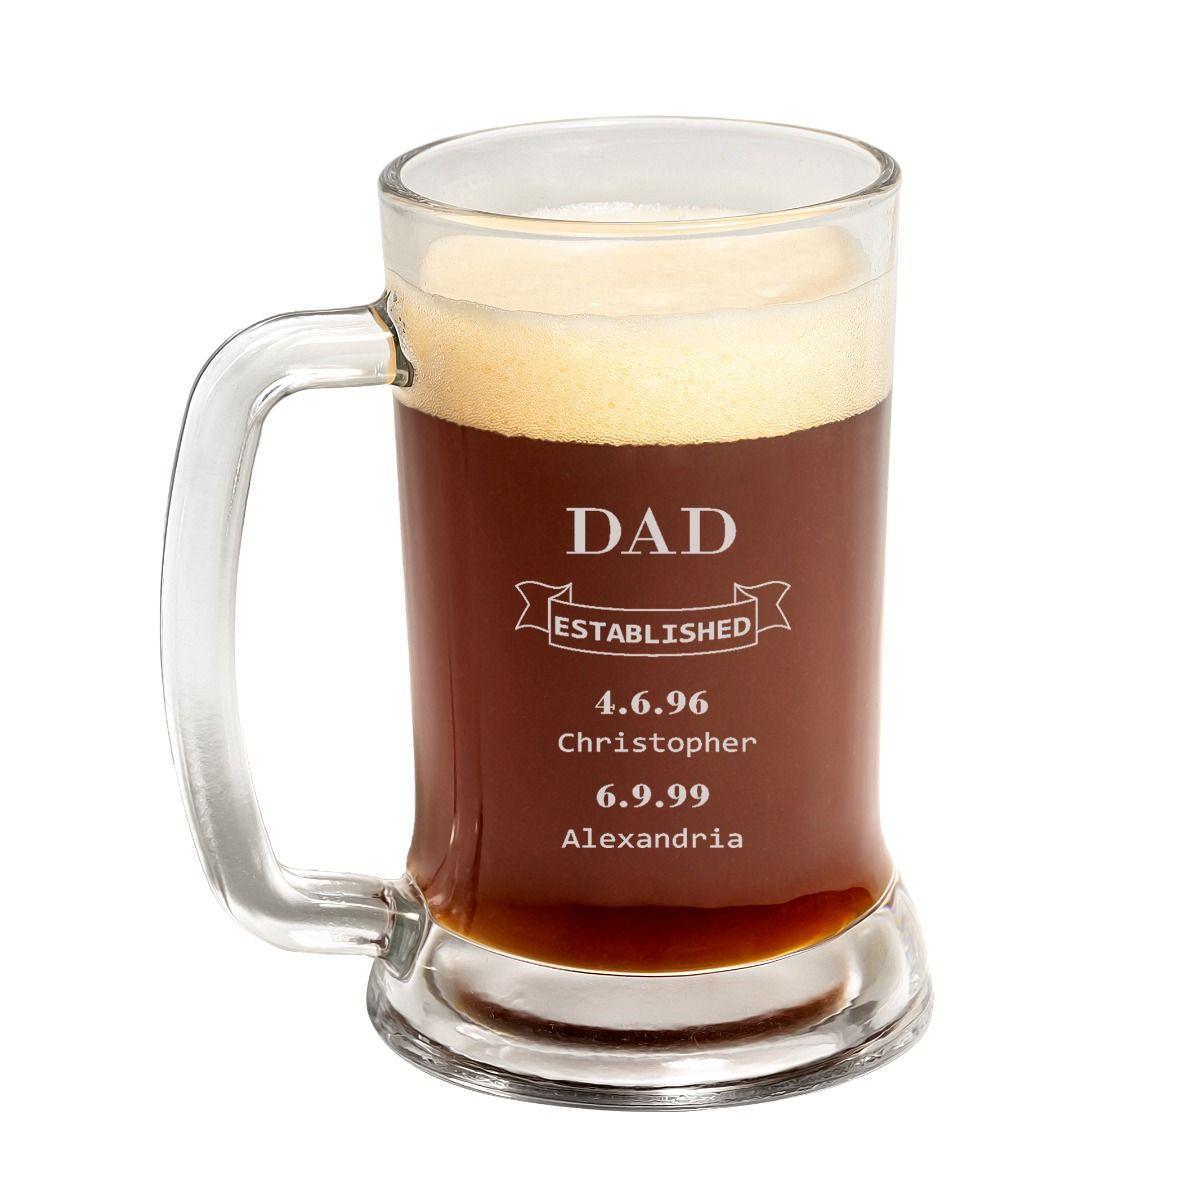 Dad EST. Father's day Beer Mug